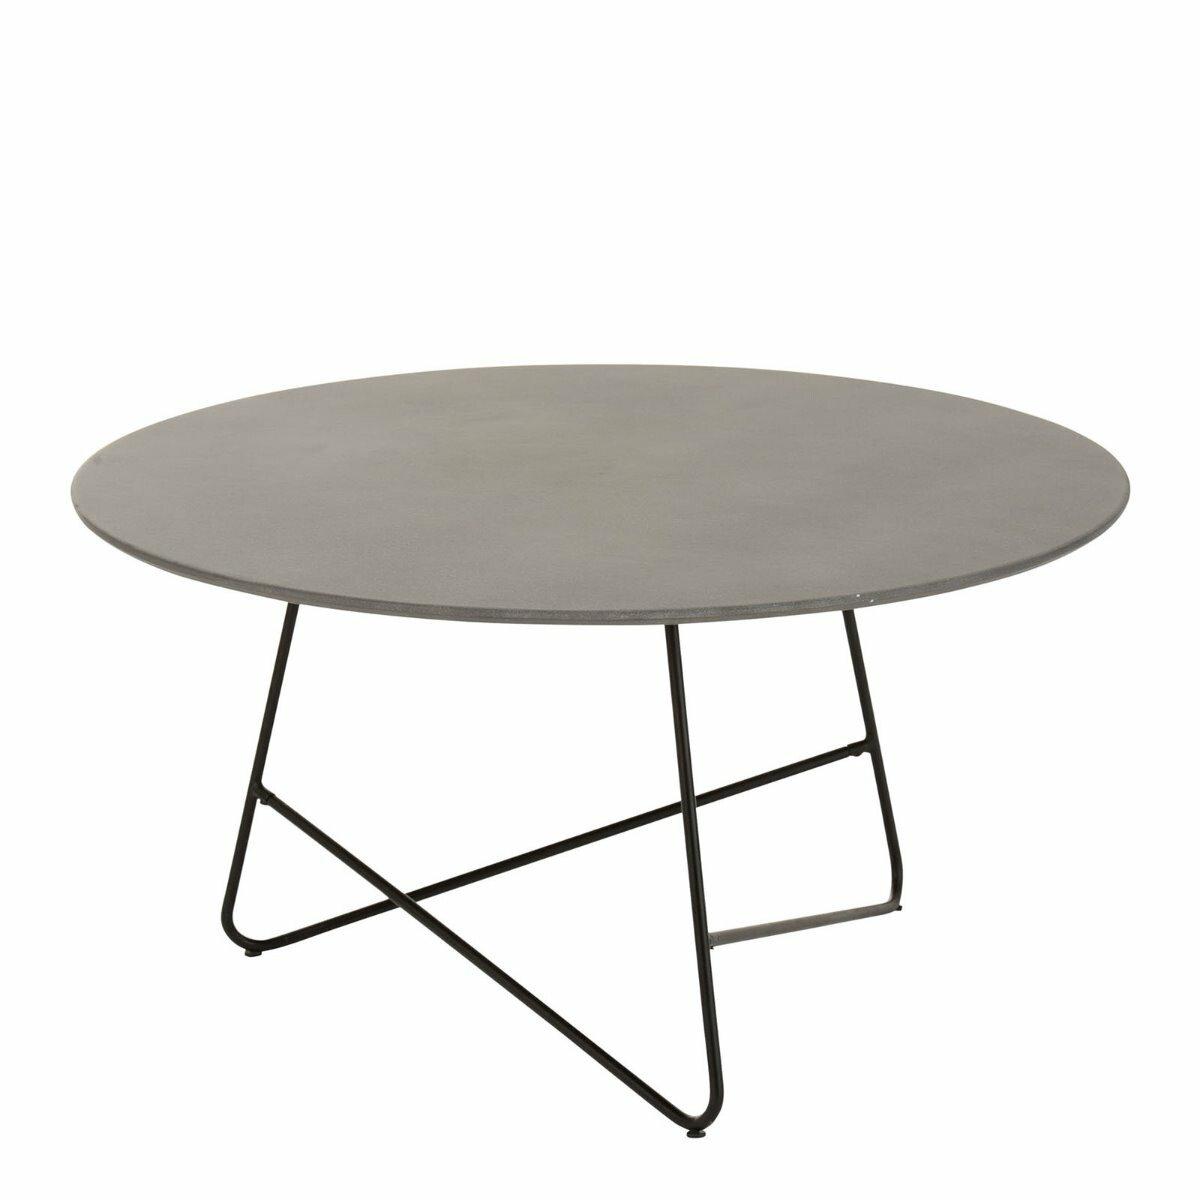 J-Line salontafel valou cement staal grijs zwart 45 x 90 x 90